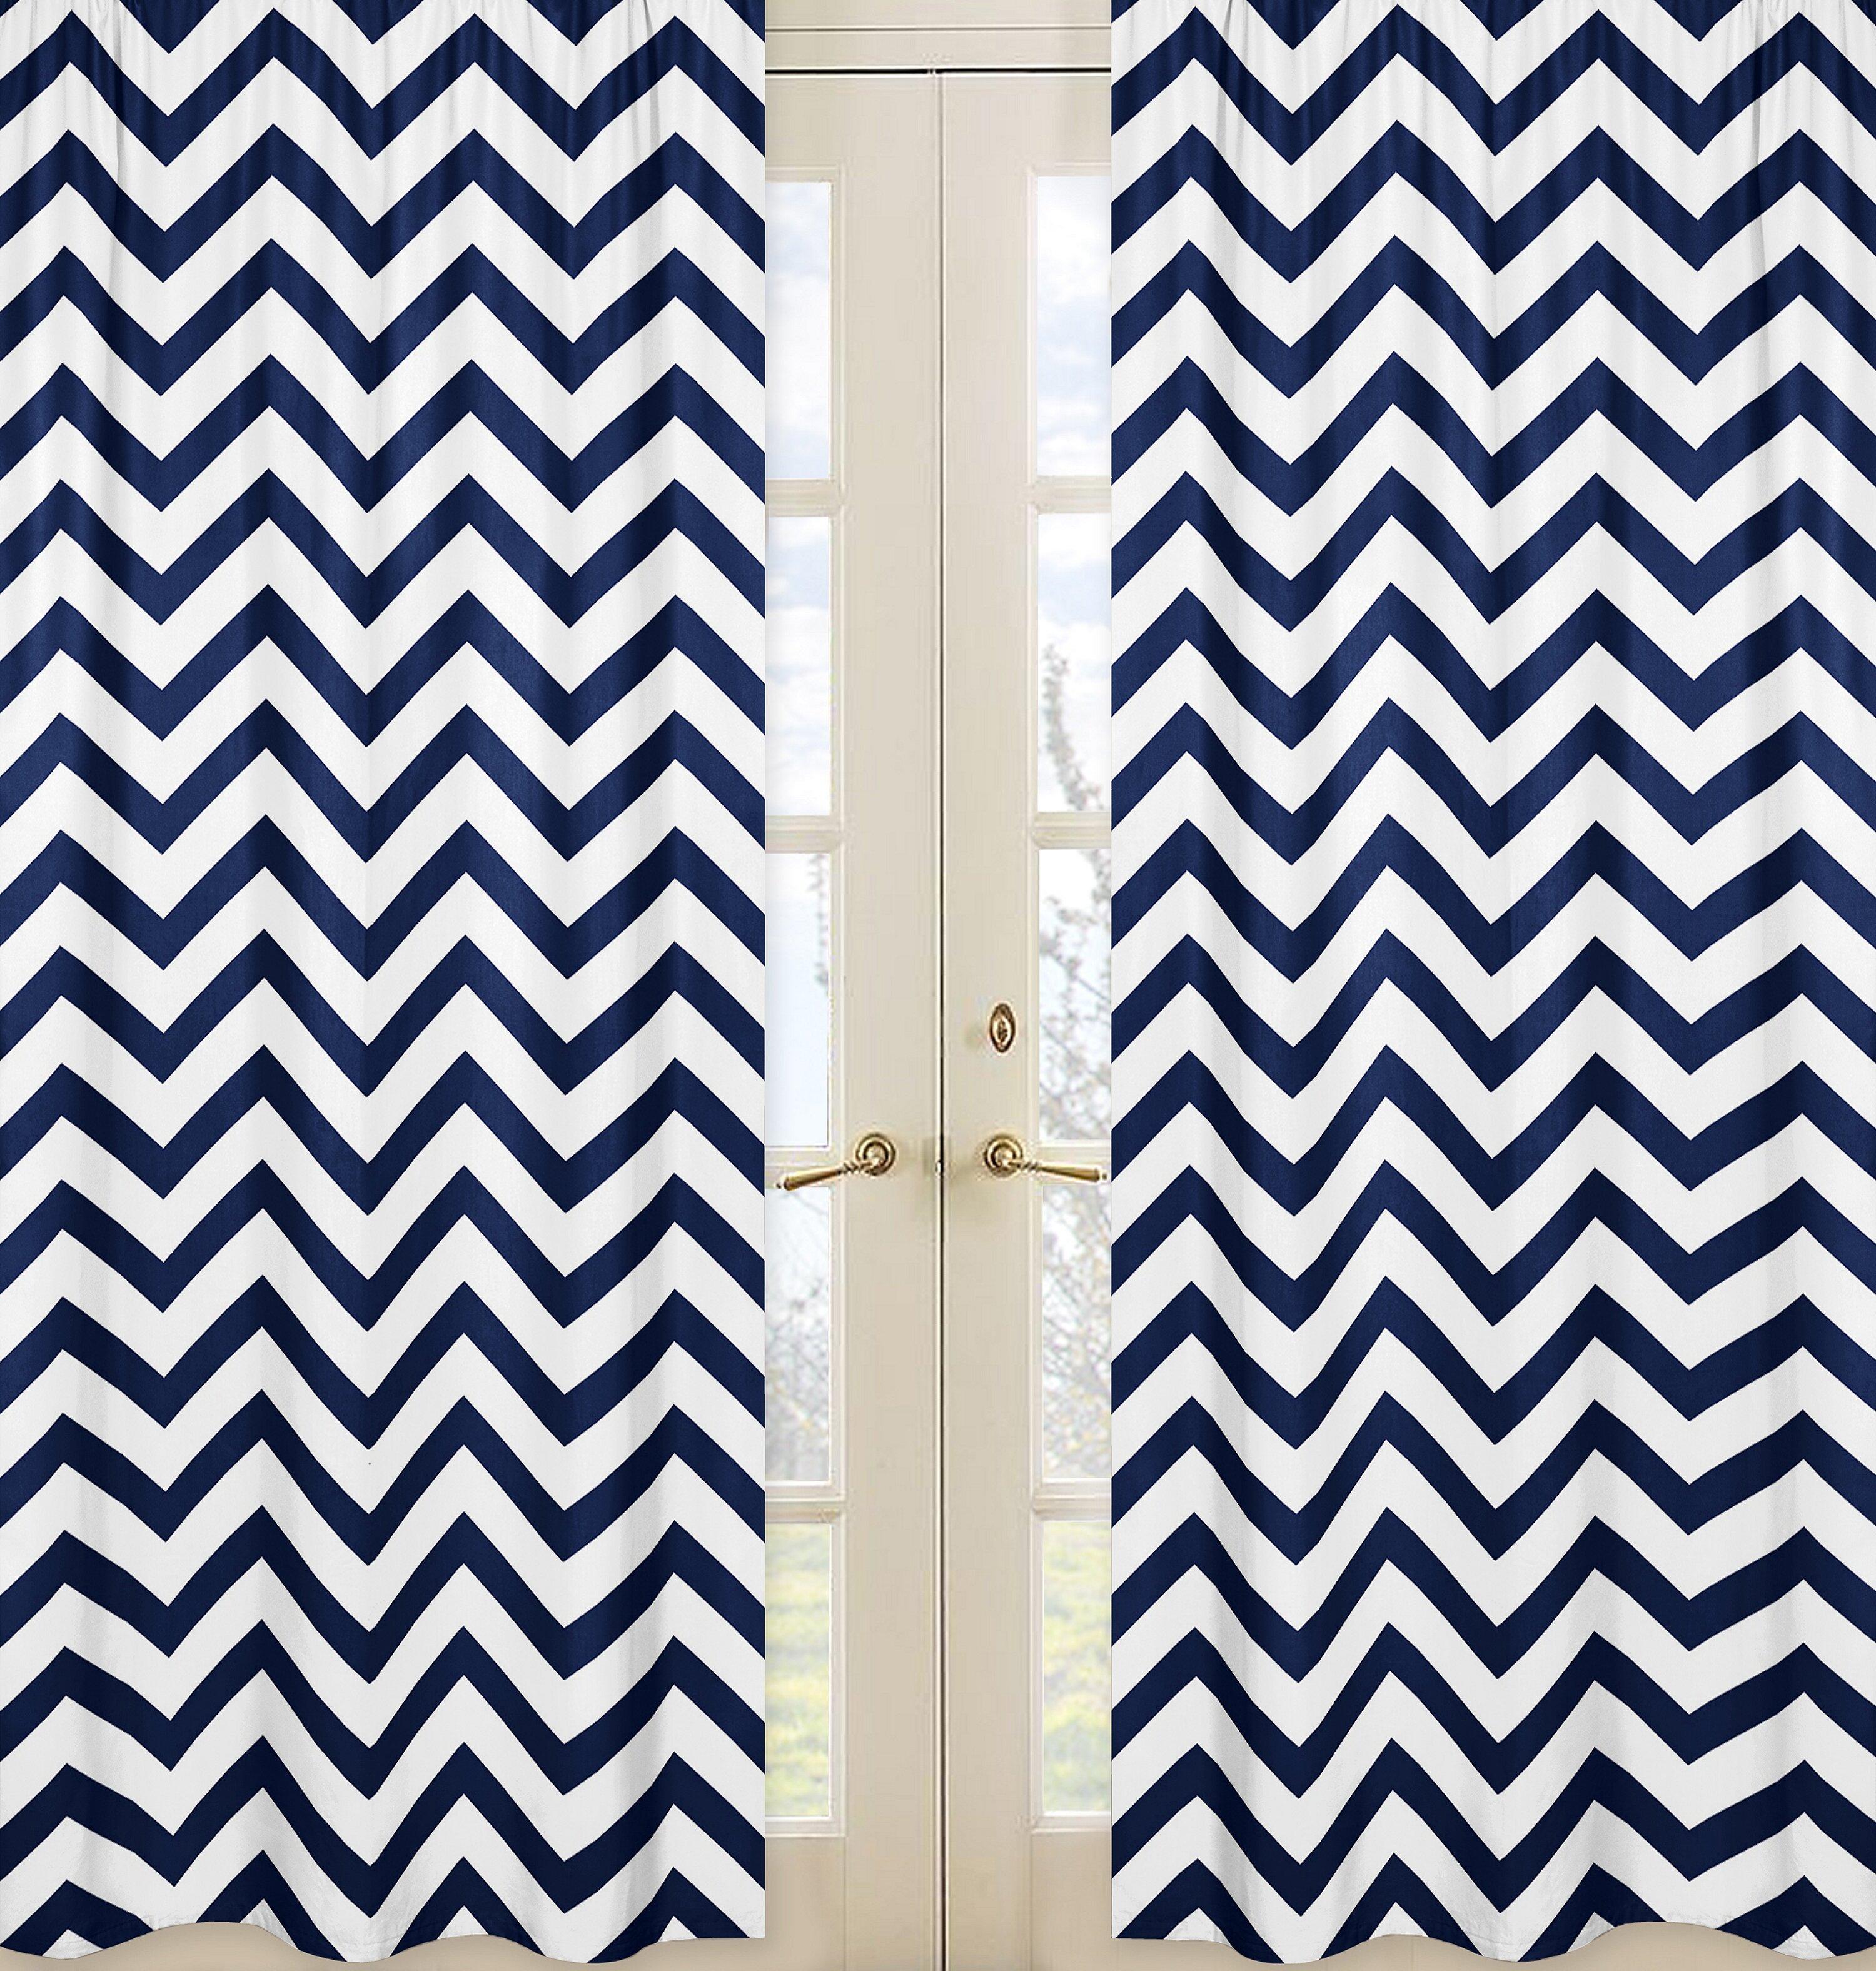 Sweet Jojo Designs Chevron Semi Sheer Rod Pocket Curtain Panels Reviews Wayfair